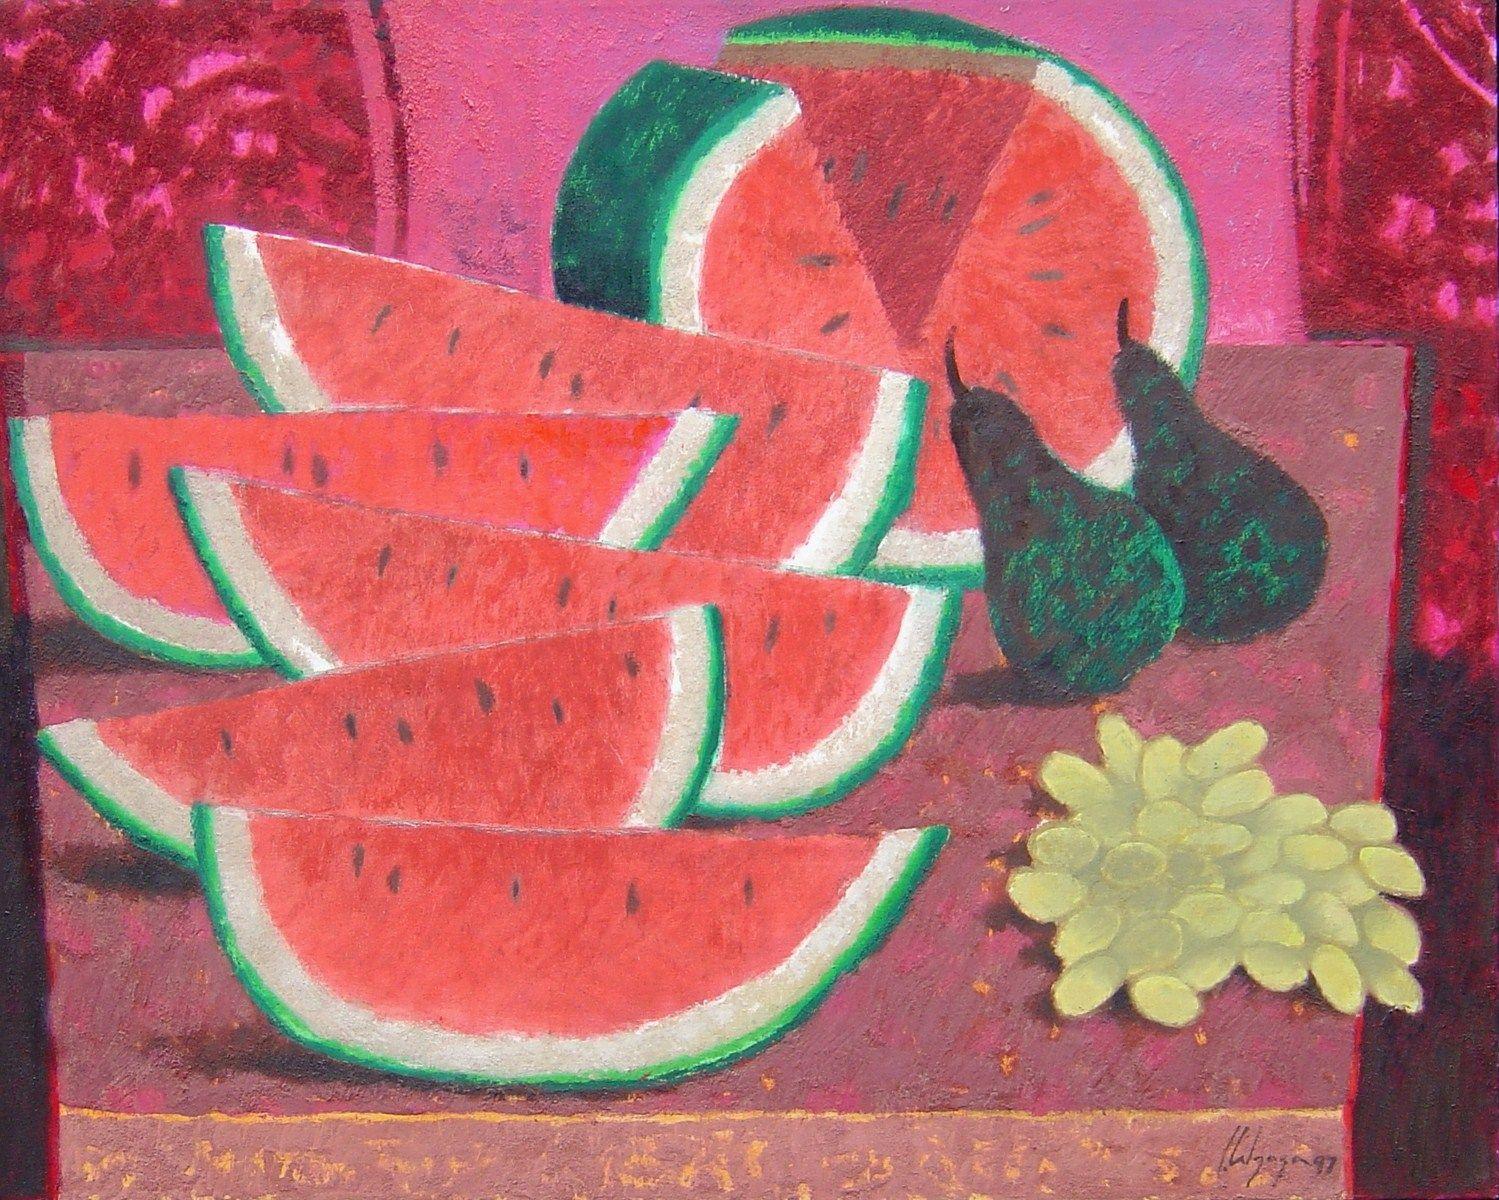 Jorge Alzaga, Sandías, 1997, óleo sobre tela, 80 x 100 cm.